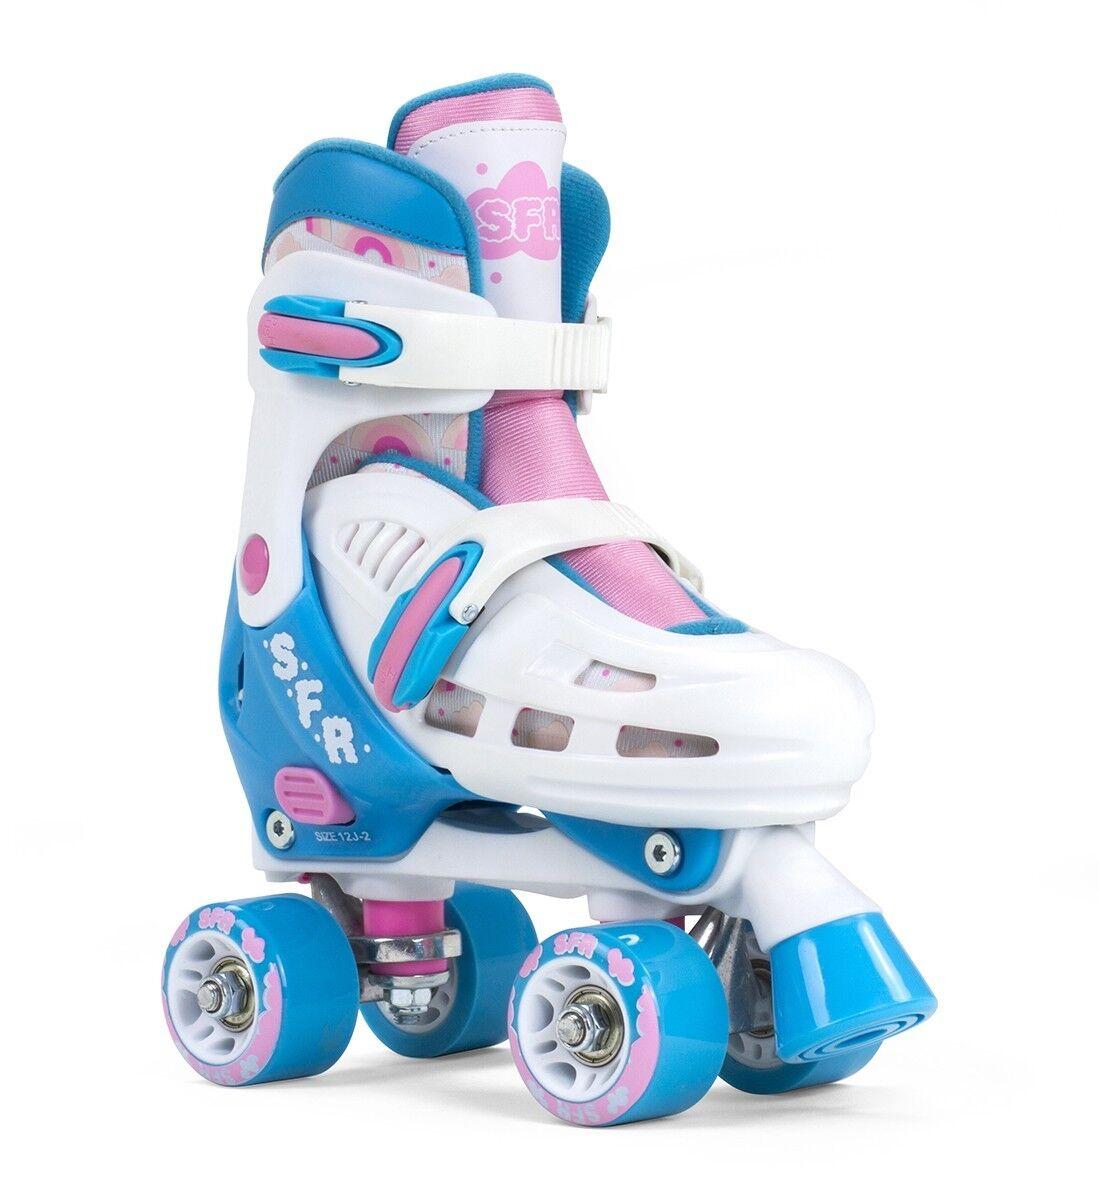 SFR Storm III Kids Adjustable Roller Skates -  Weiß / Rosa